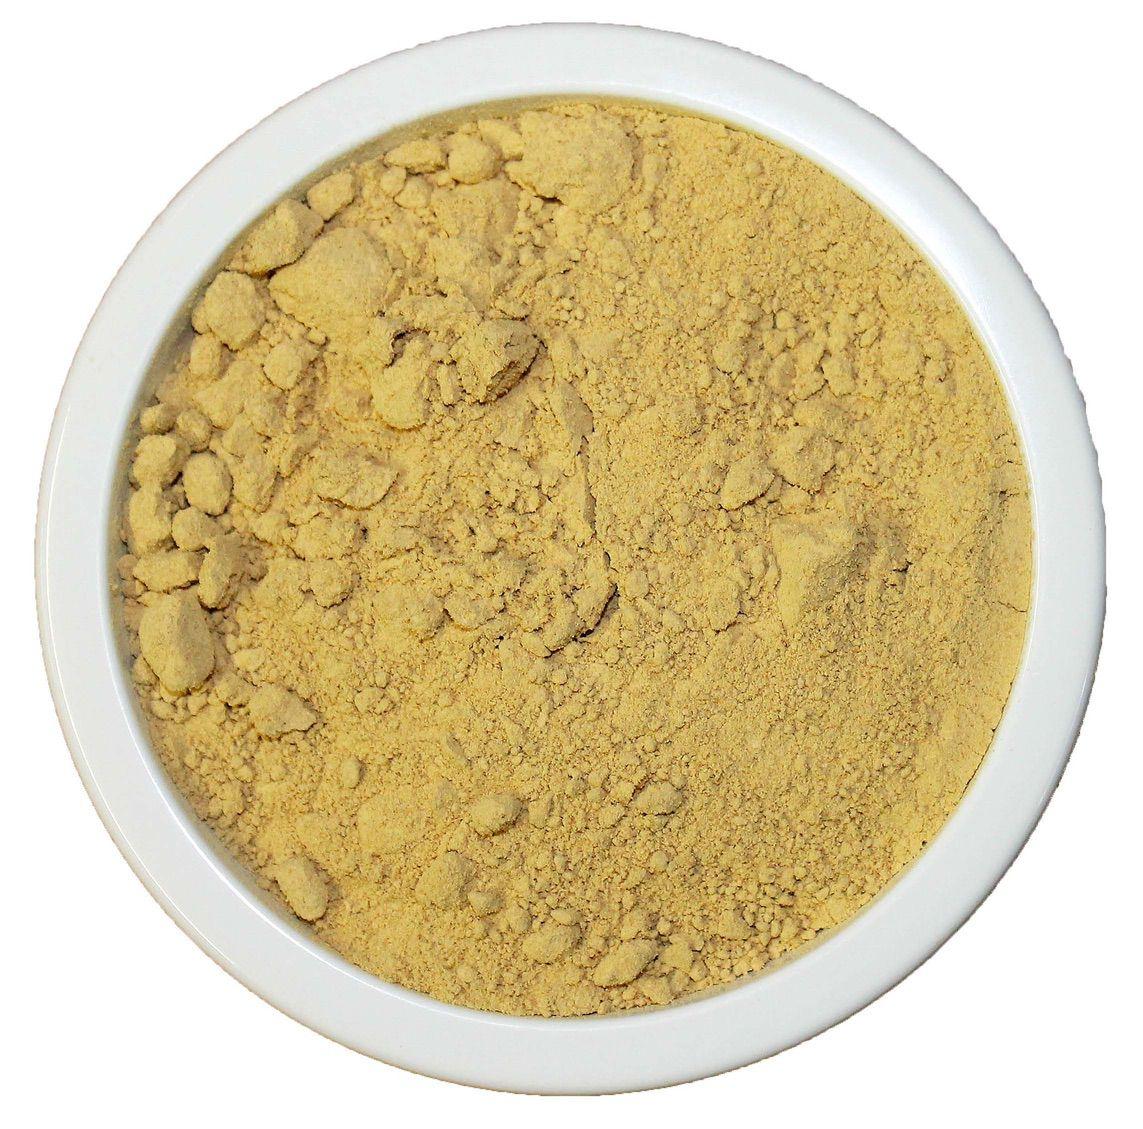 Ingwer Ingwerwurzel geschält gemahlen 1 kg Gewürz TOP Qualität PEnandiTRA ®